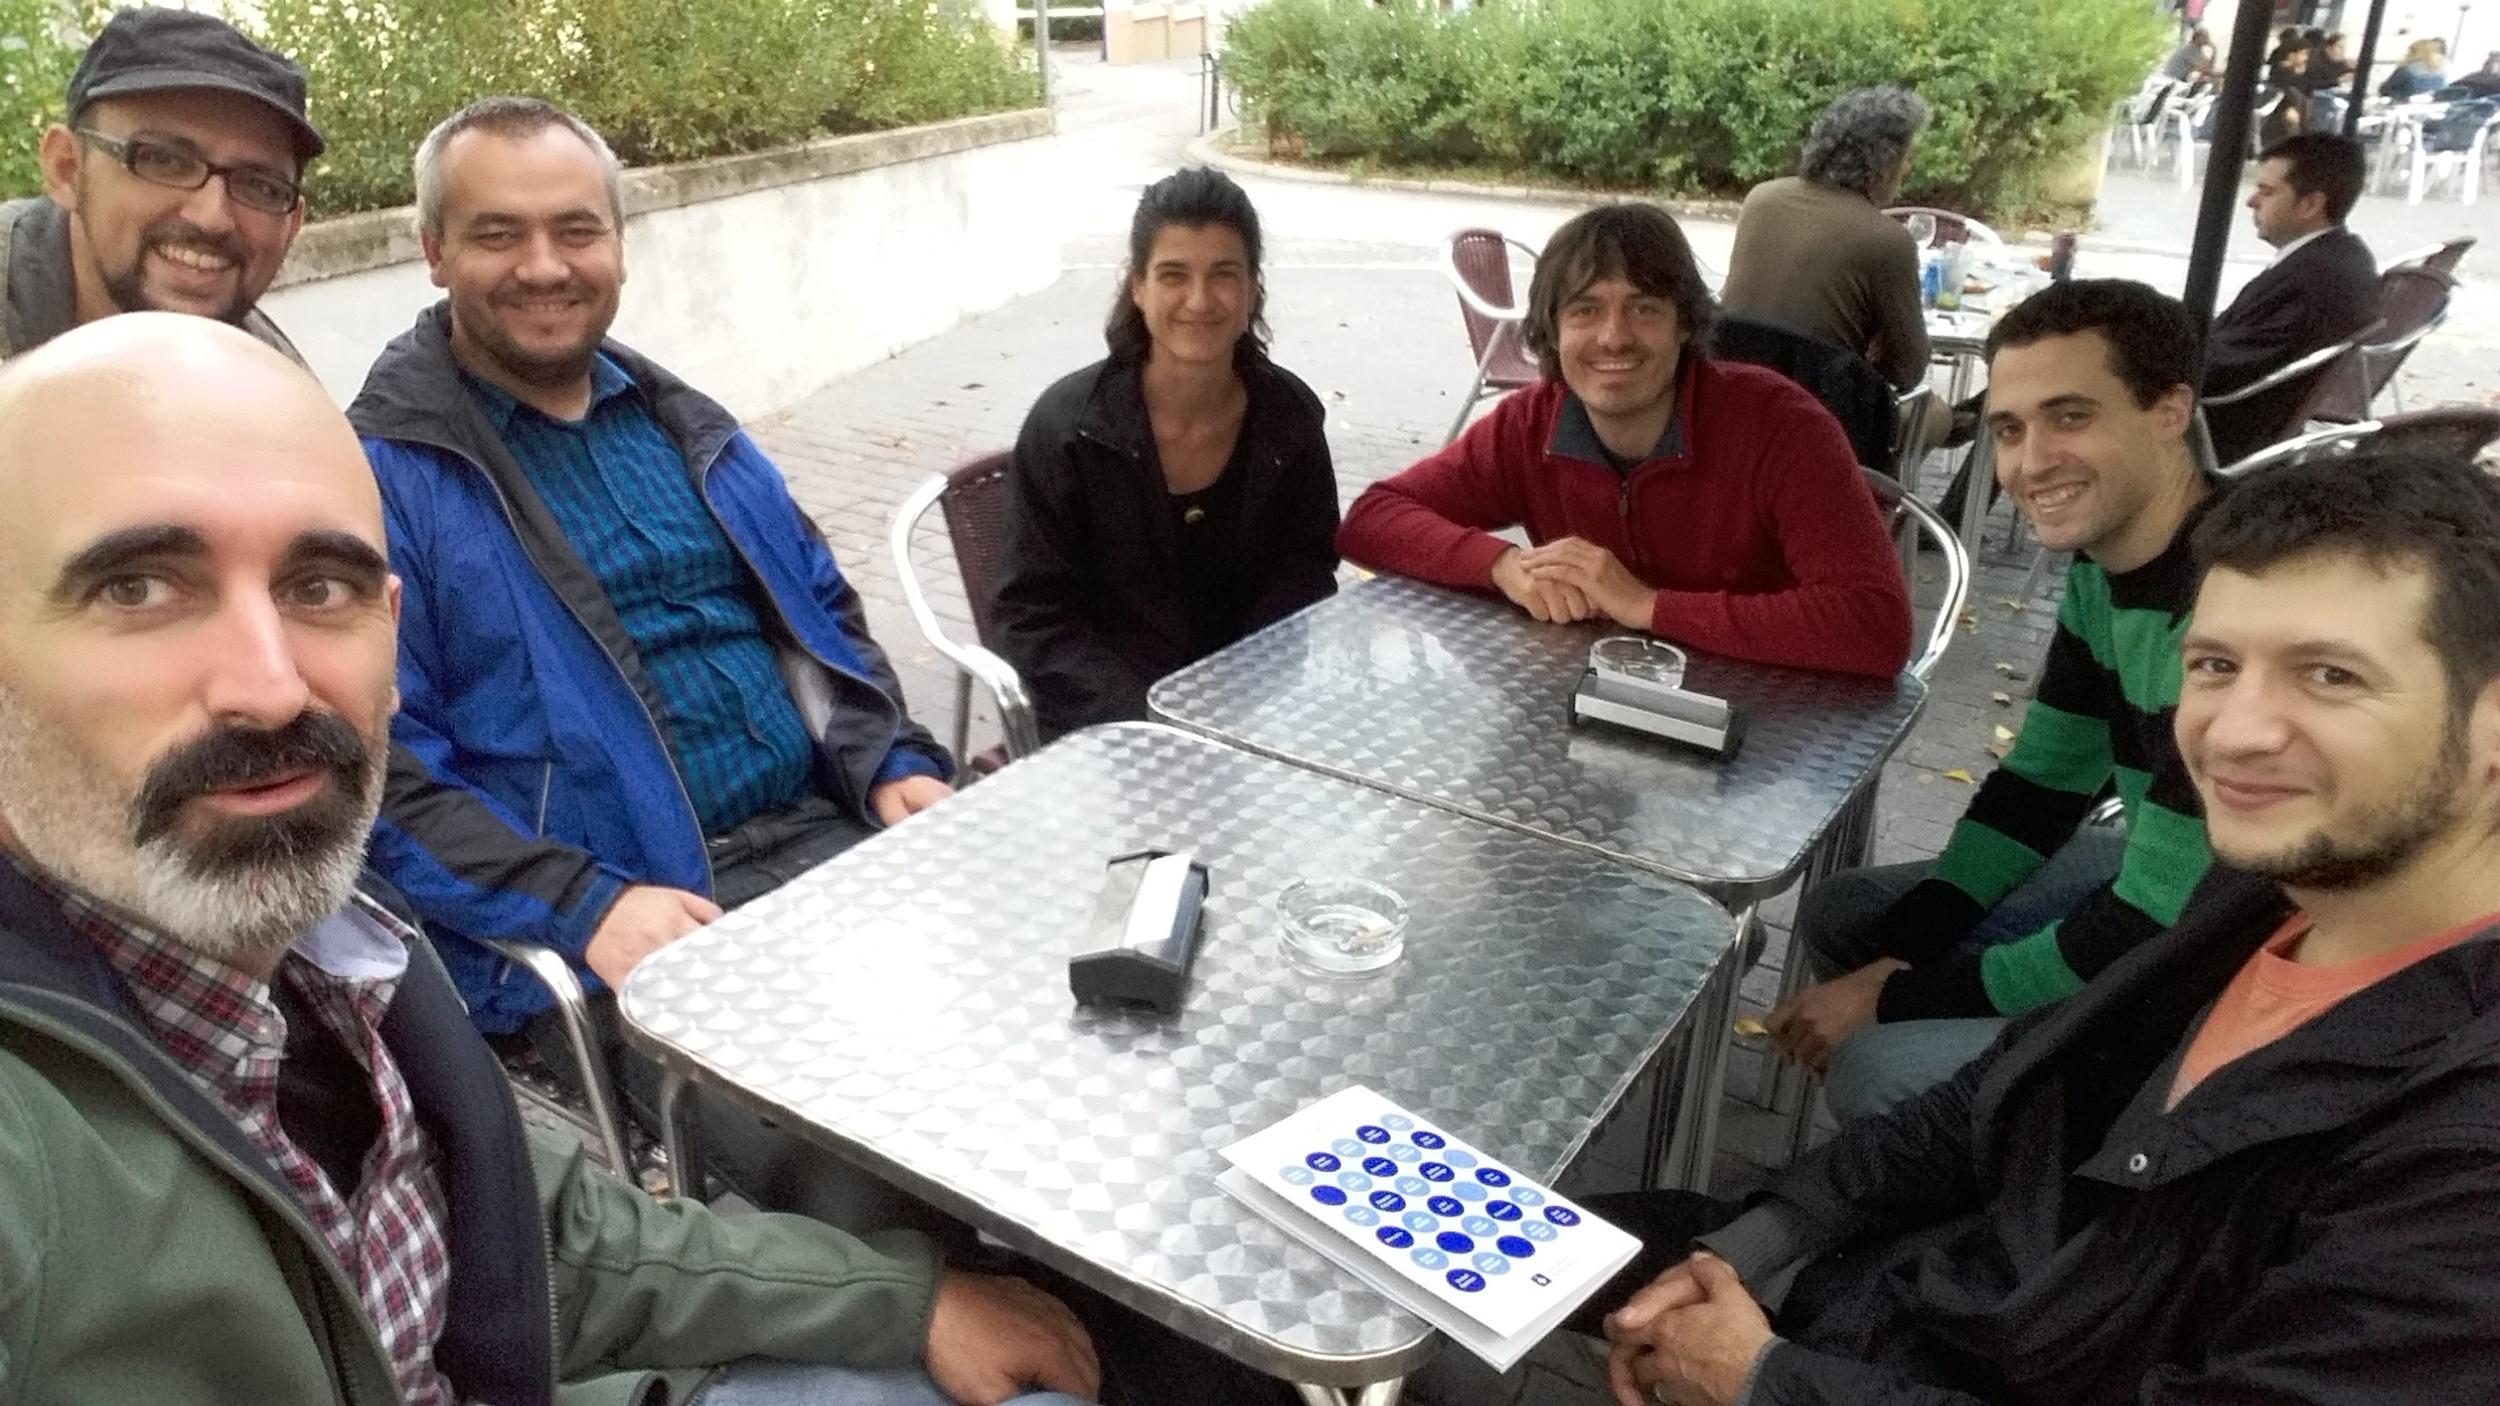 Lunch break between Goteo, Oberliht and Radarq